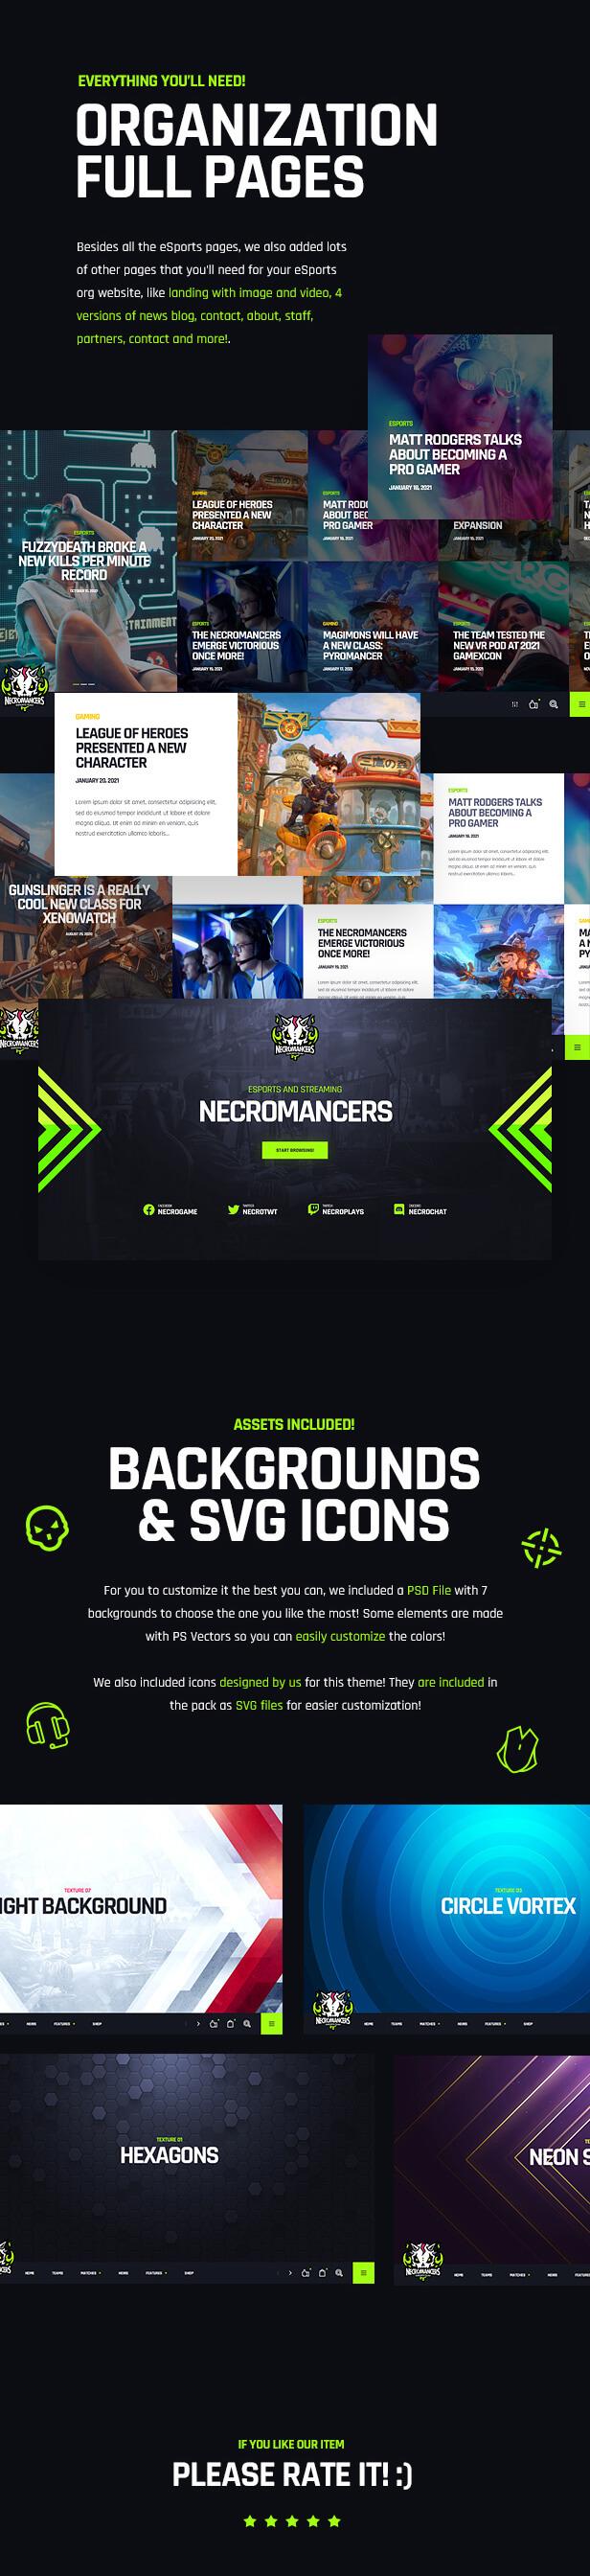 Necromancers - eSports & Gaming Team WordPress Theme - Features